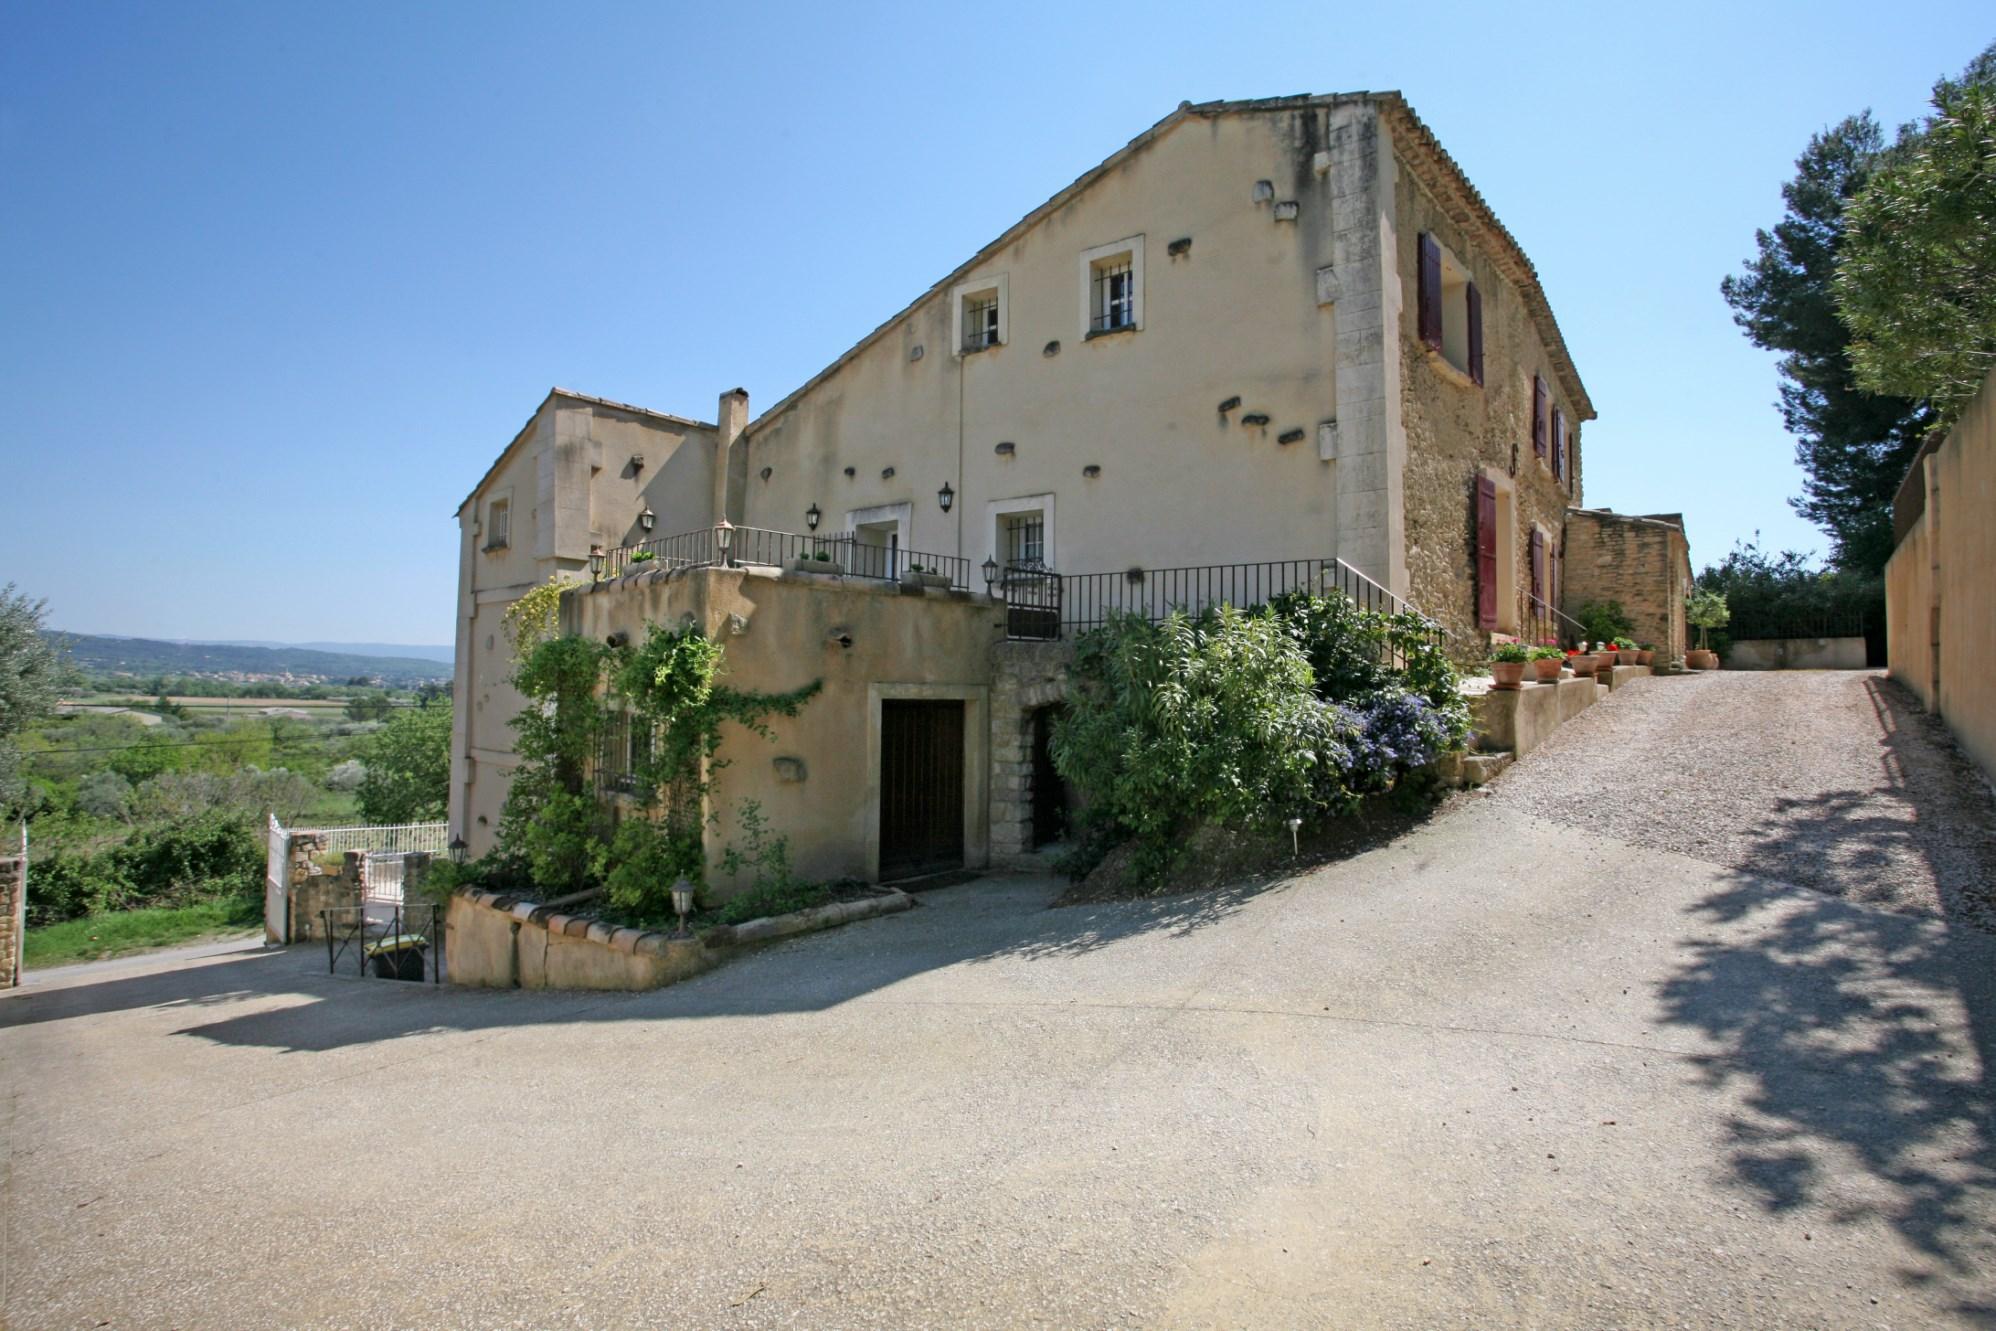 Ventes en vente en provence belle maison de famille avec gites jardin et piscine agence rosier - Table maison de famille ...